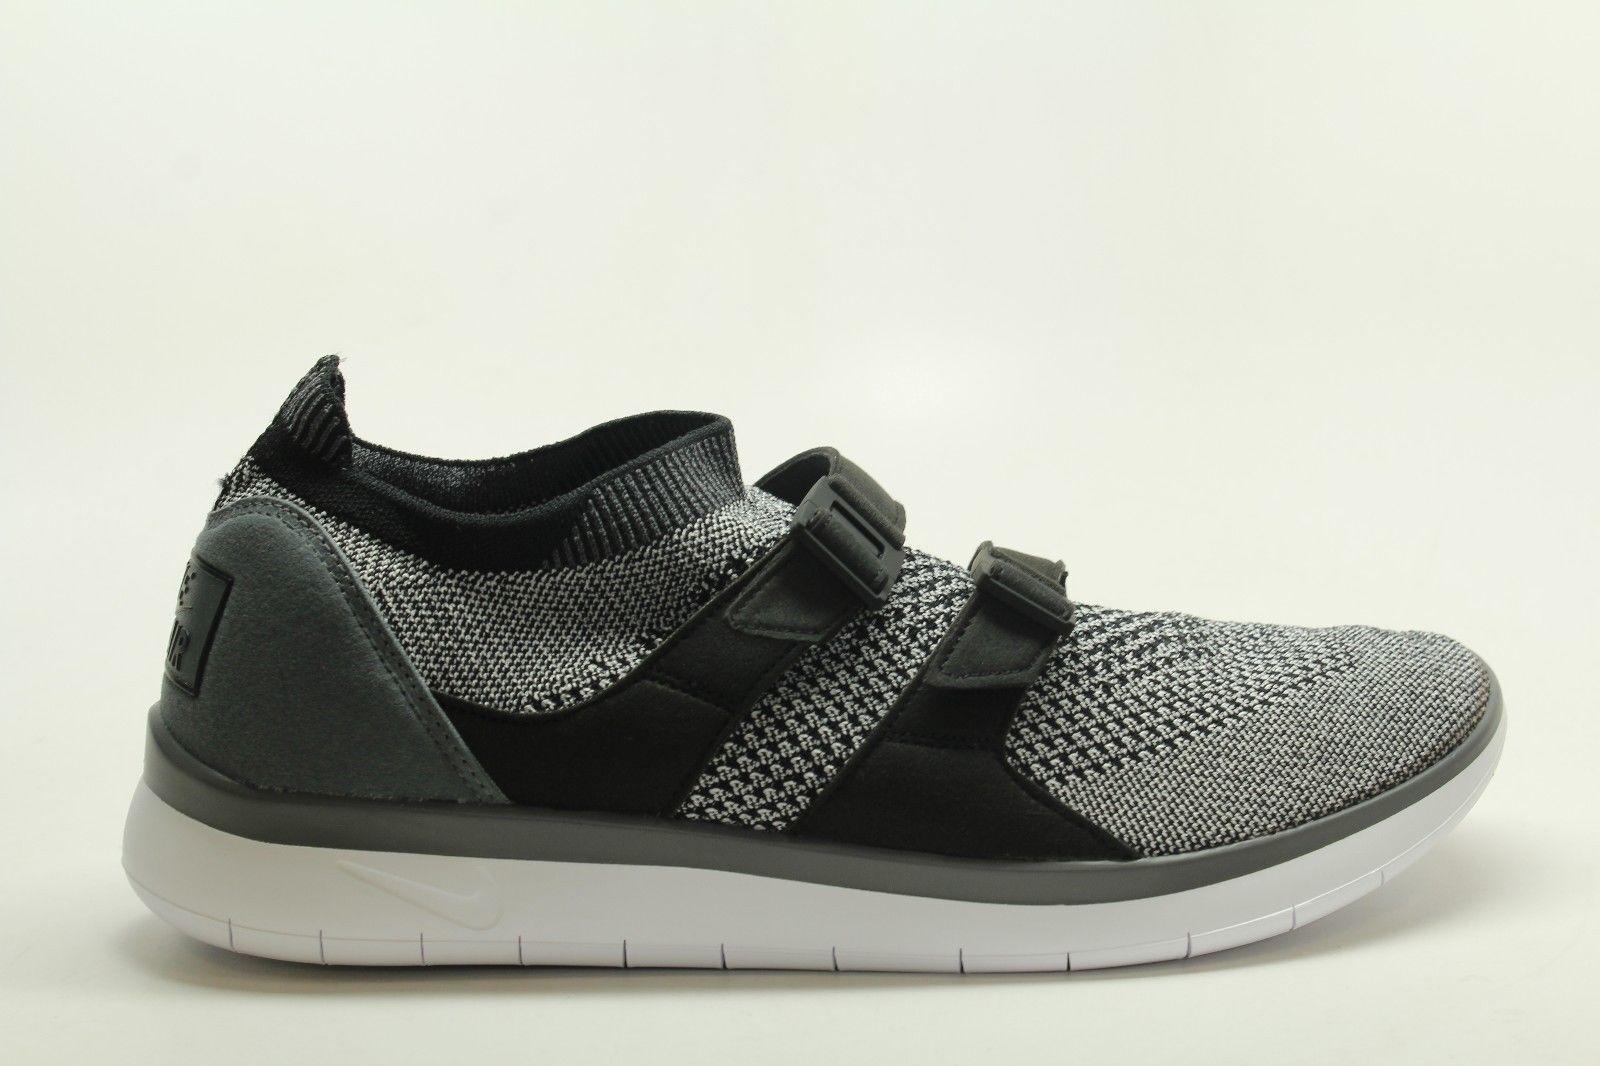 New Nike Air Sockracer Flyknit Uomo Running Training Shoes Grey/Nero 898022 100